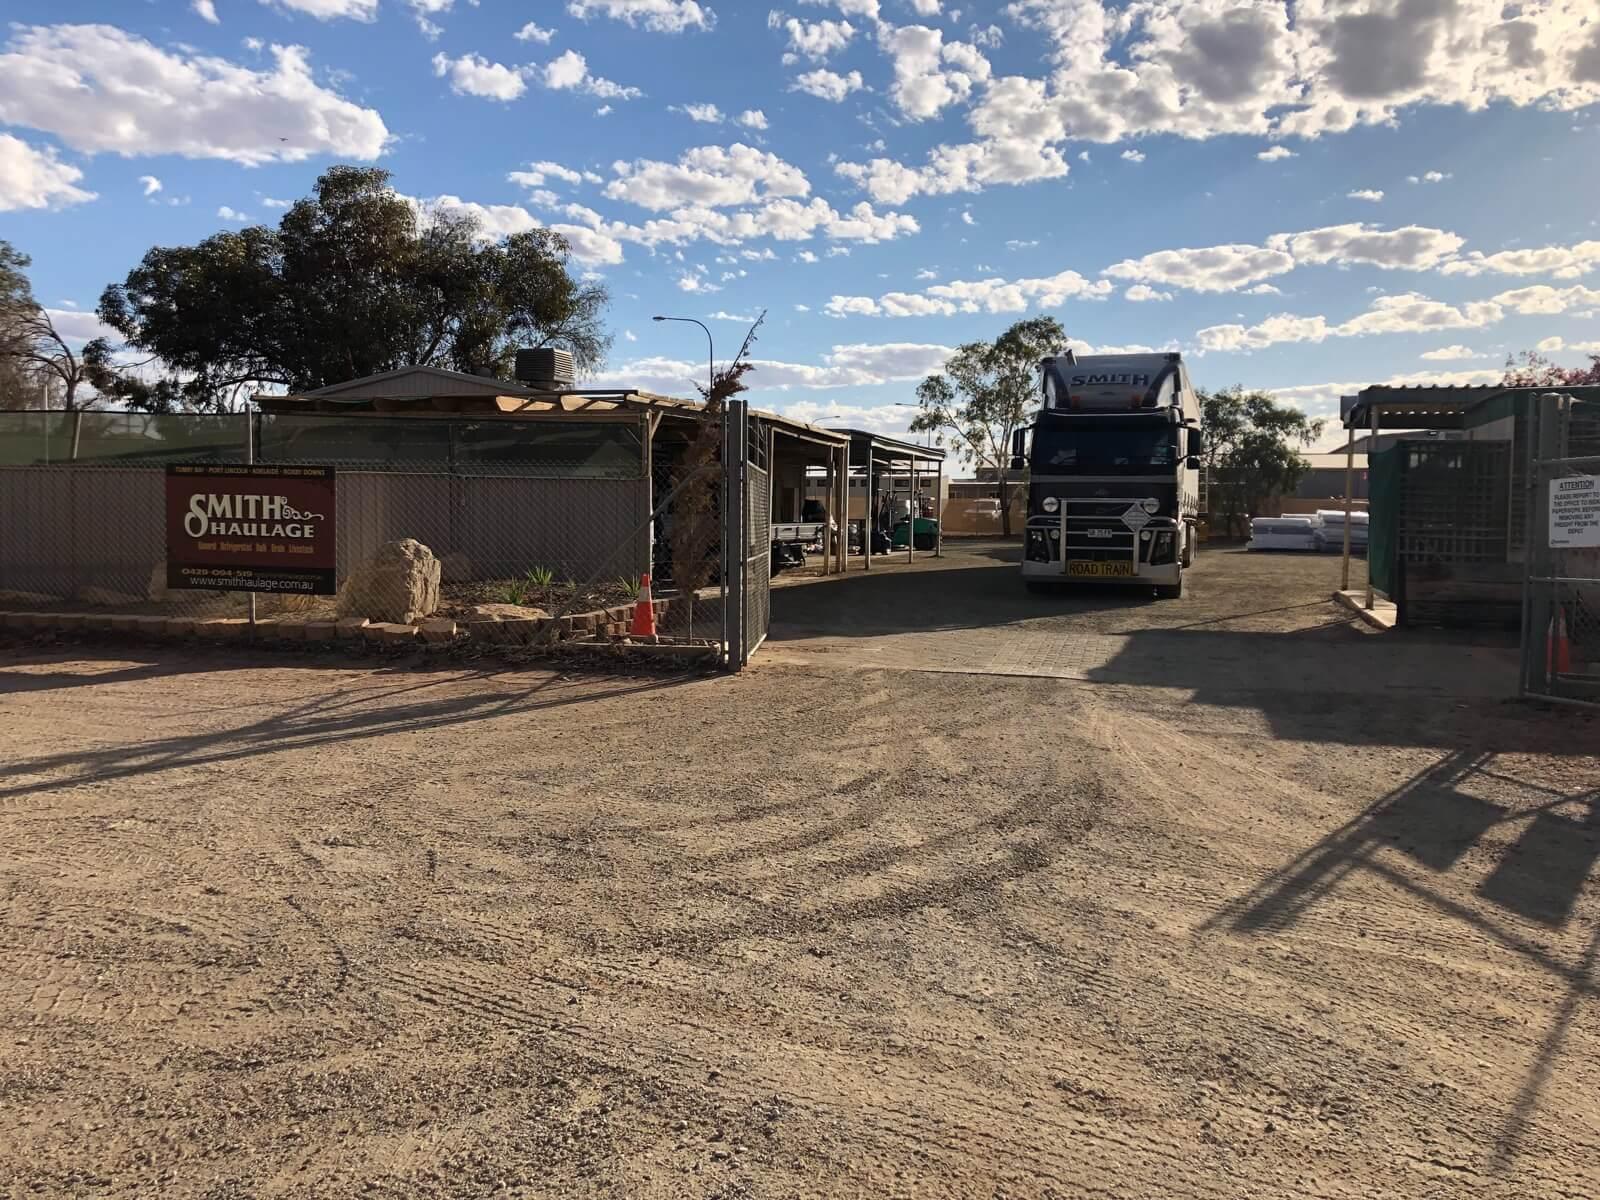 https://www.smithhaulage.com.au/wp-content/uploads/2017/05/Roxby-Downs-Depot.jpg